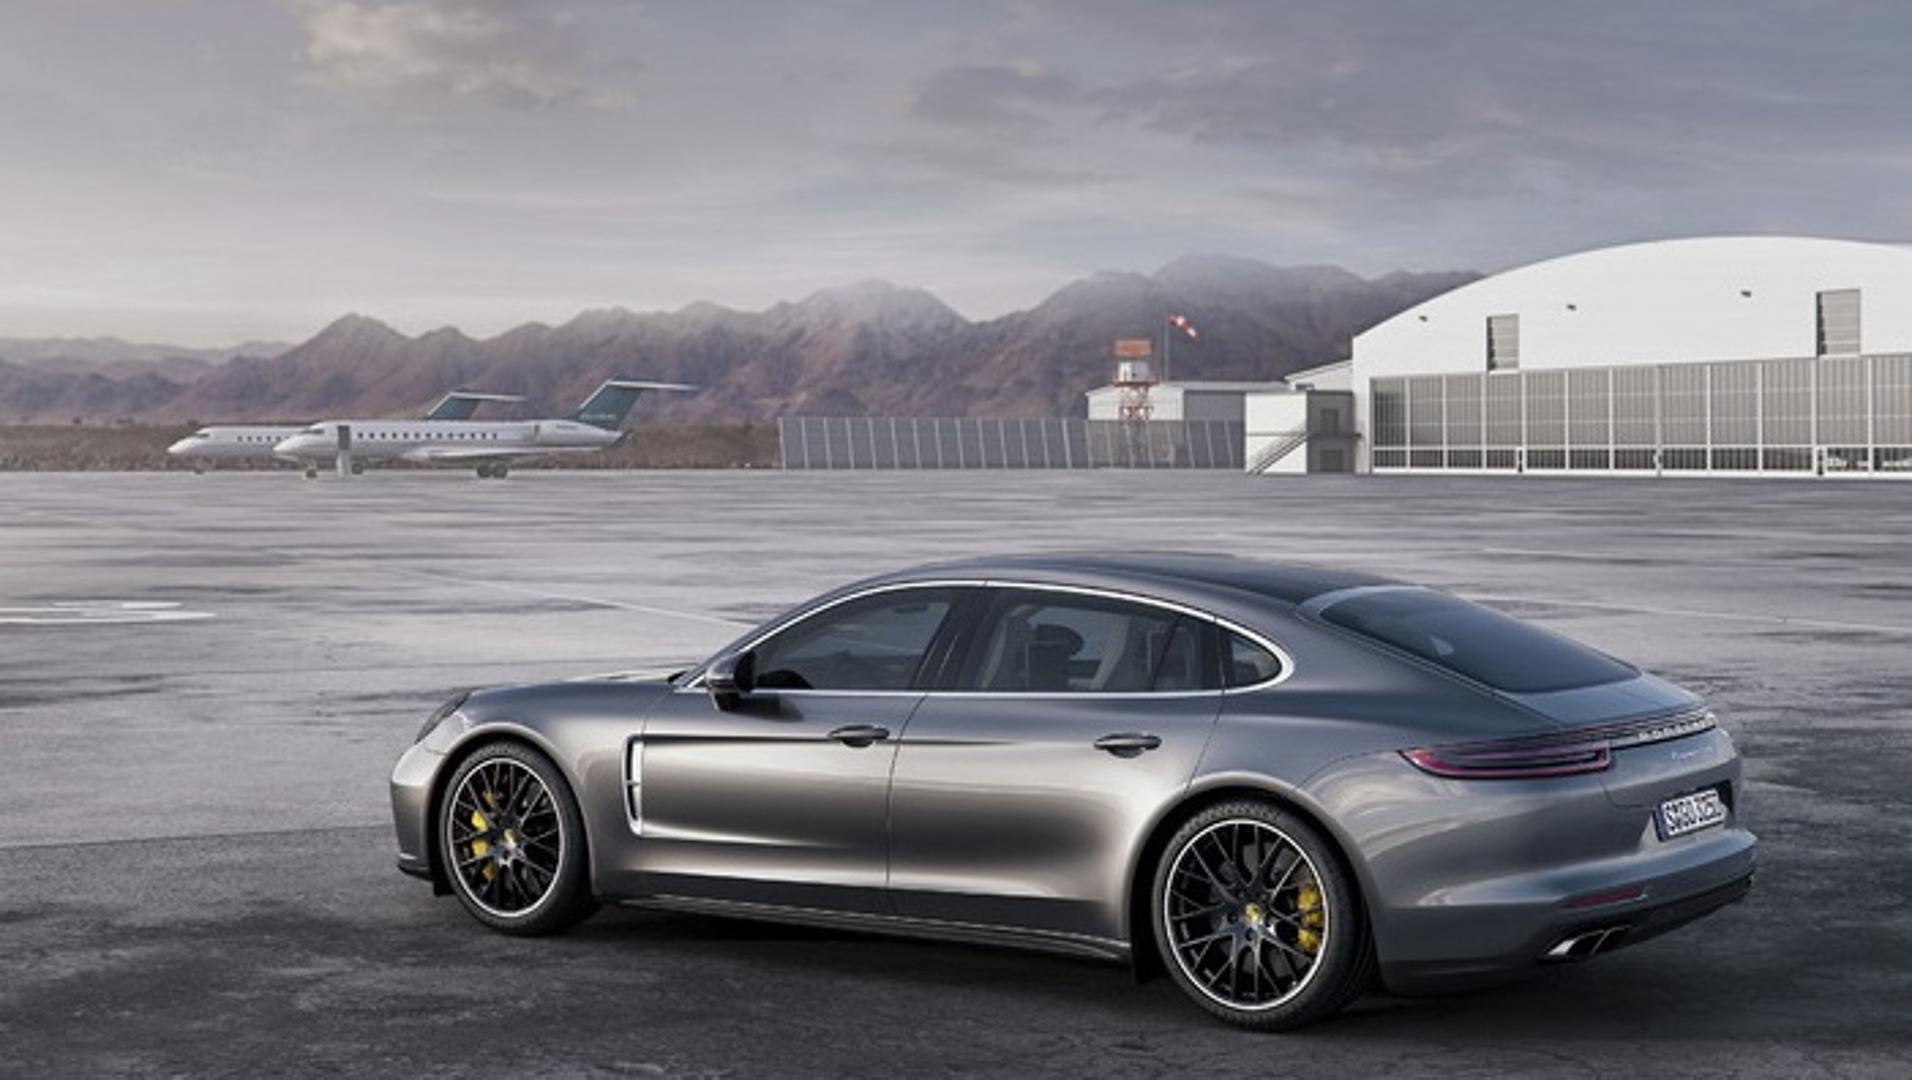 Porsche Recalls All Current Generation Panameras For Power